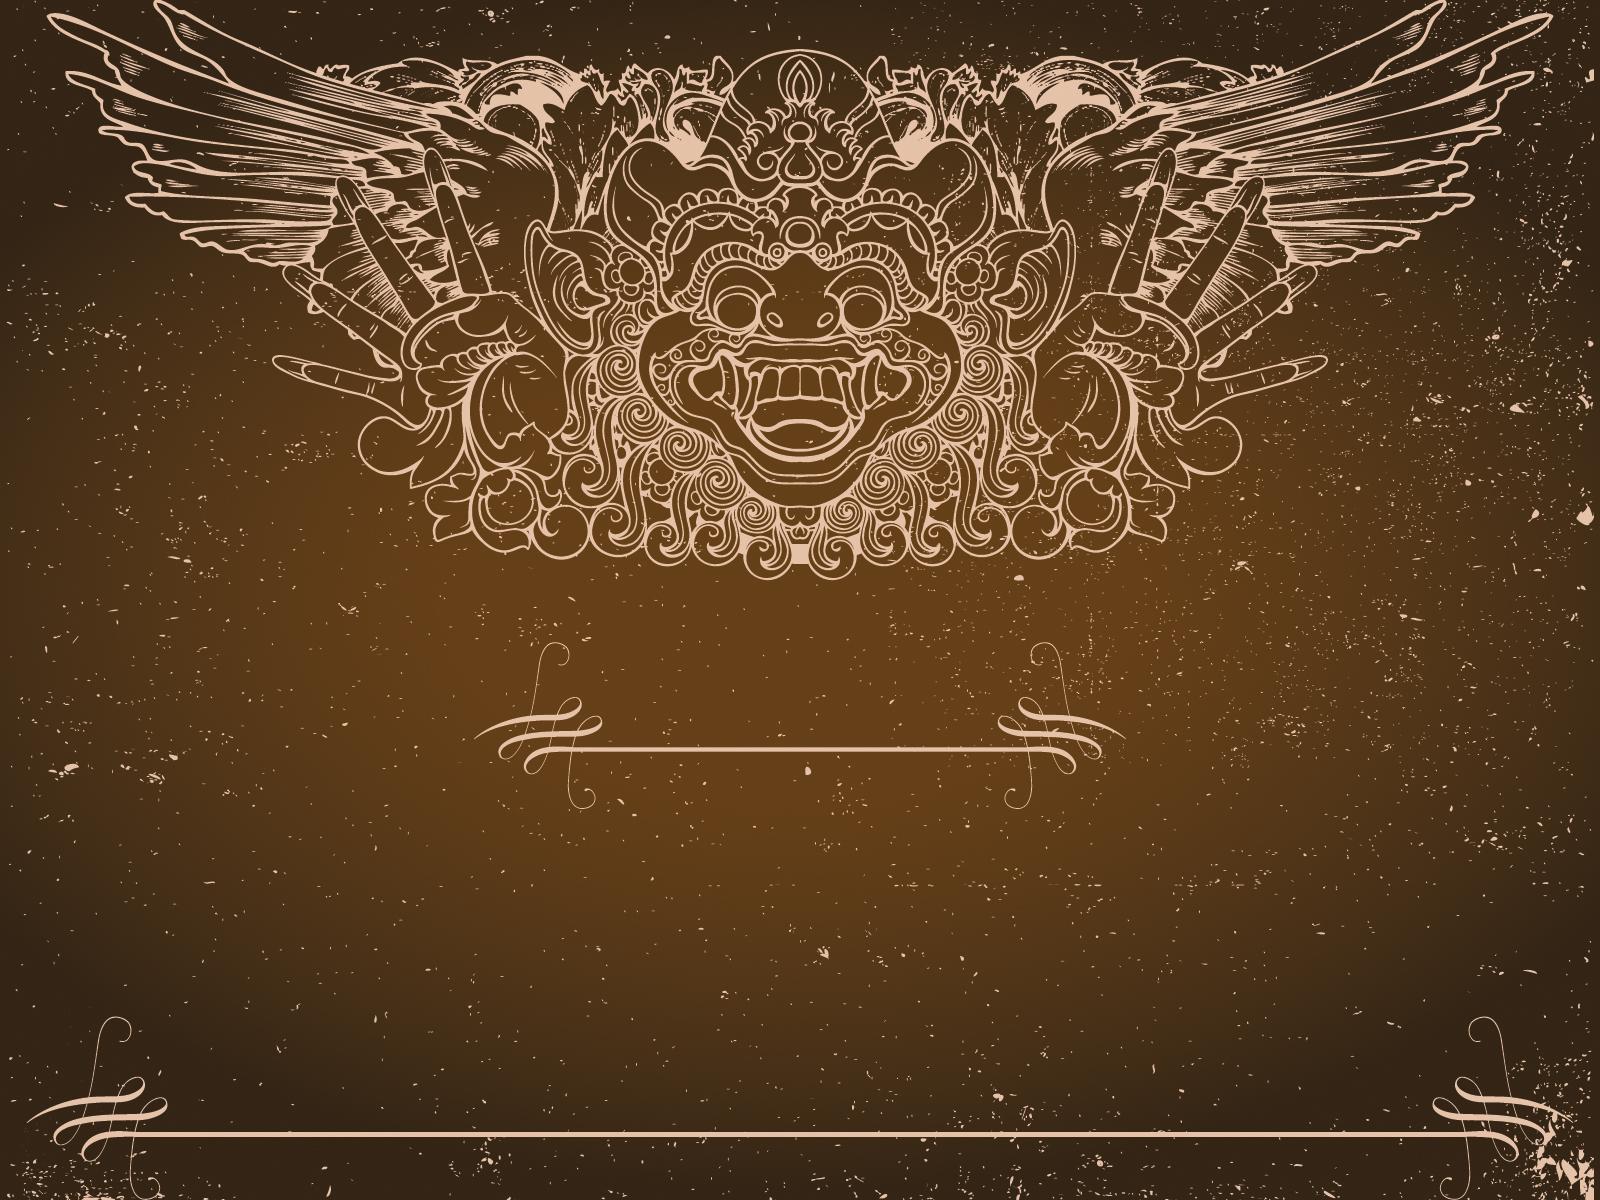 Totem Faith Grunge PPT Backgrounds - Beige, Border ...